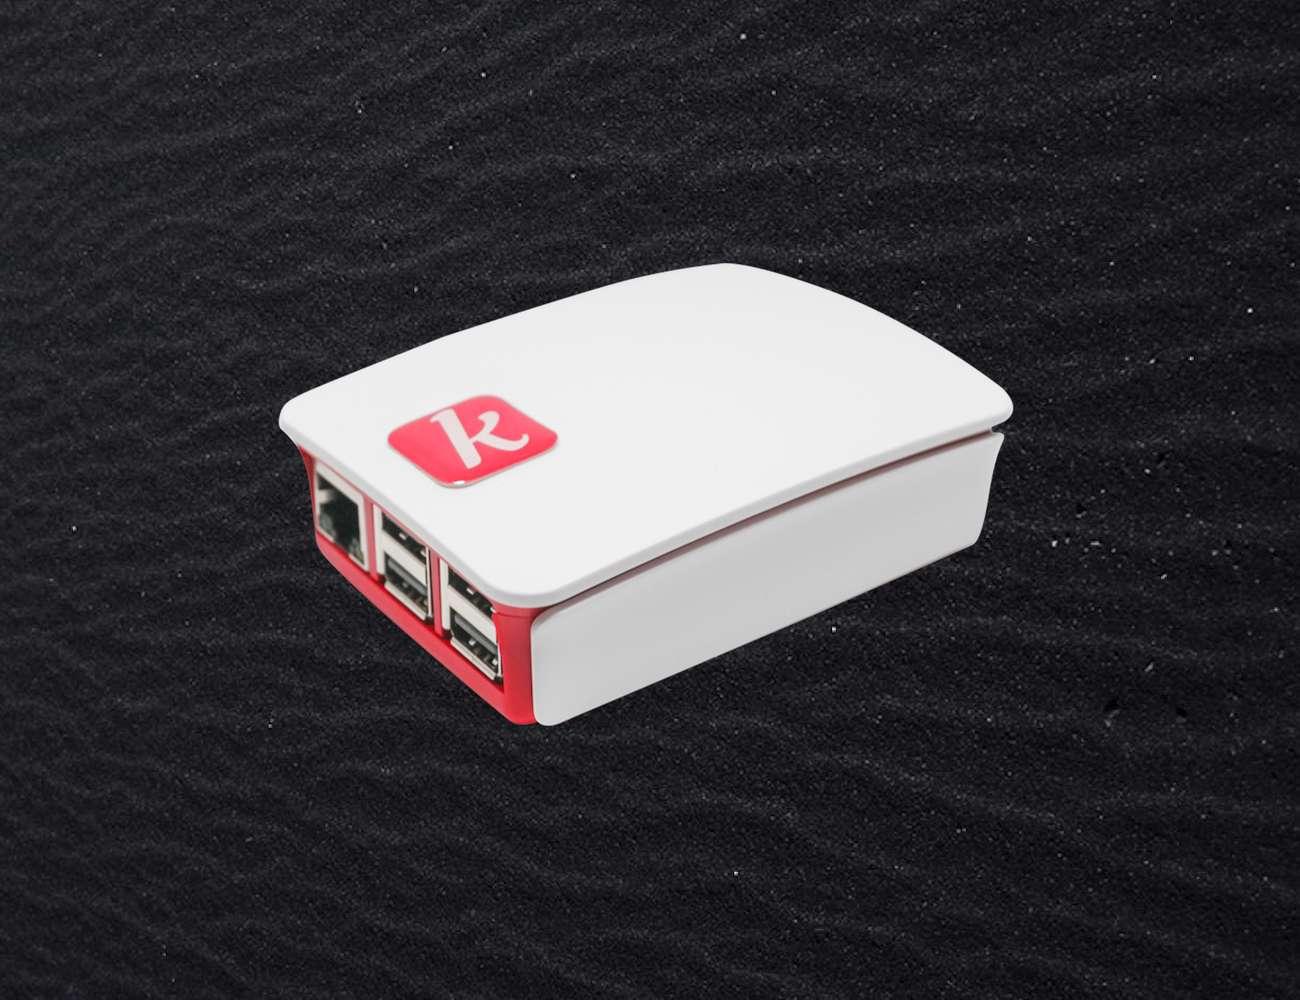 Kwilt Shoebox Plus Unlimited Personal Storage Device